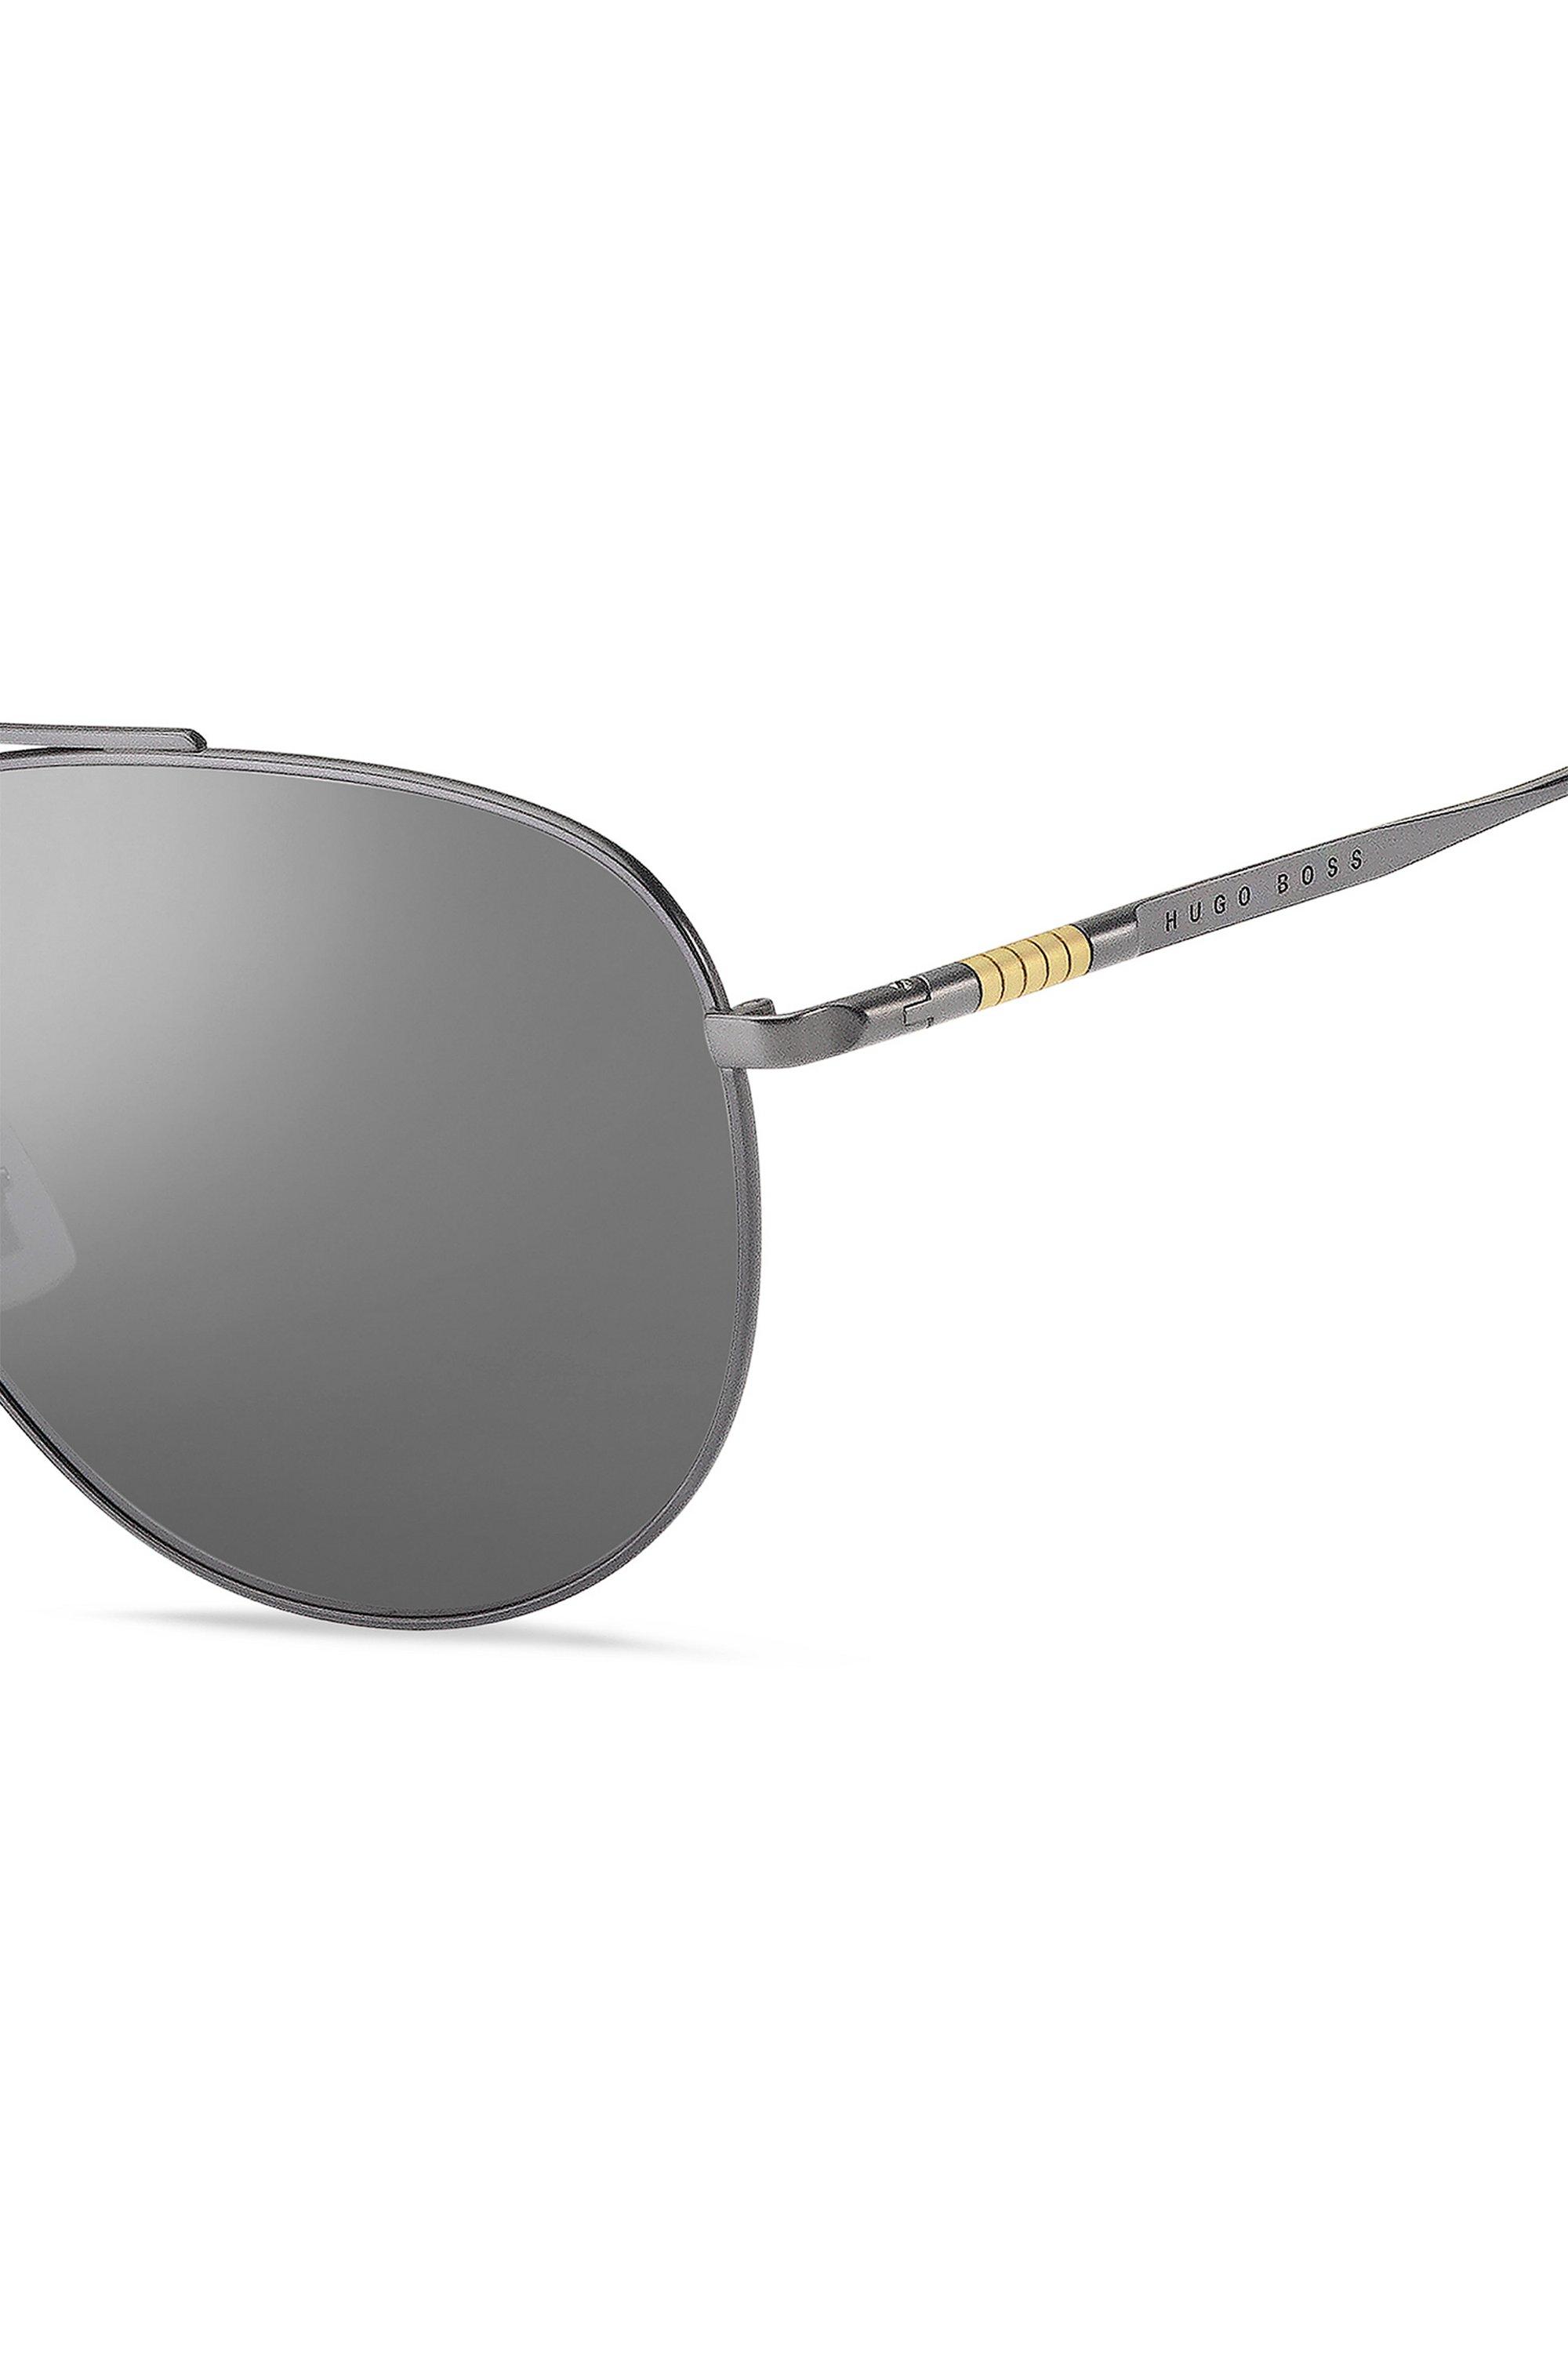 Double-bridge sunglasses with silver mirrored lenses